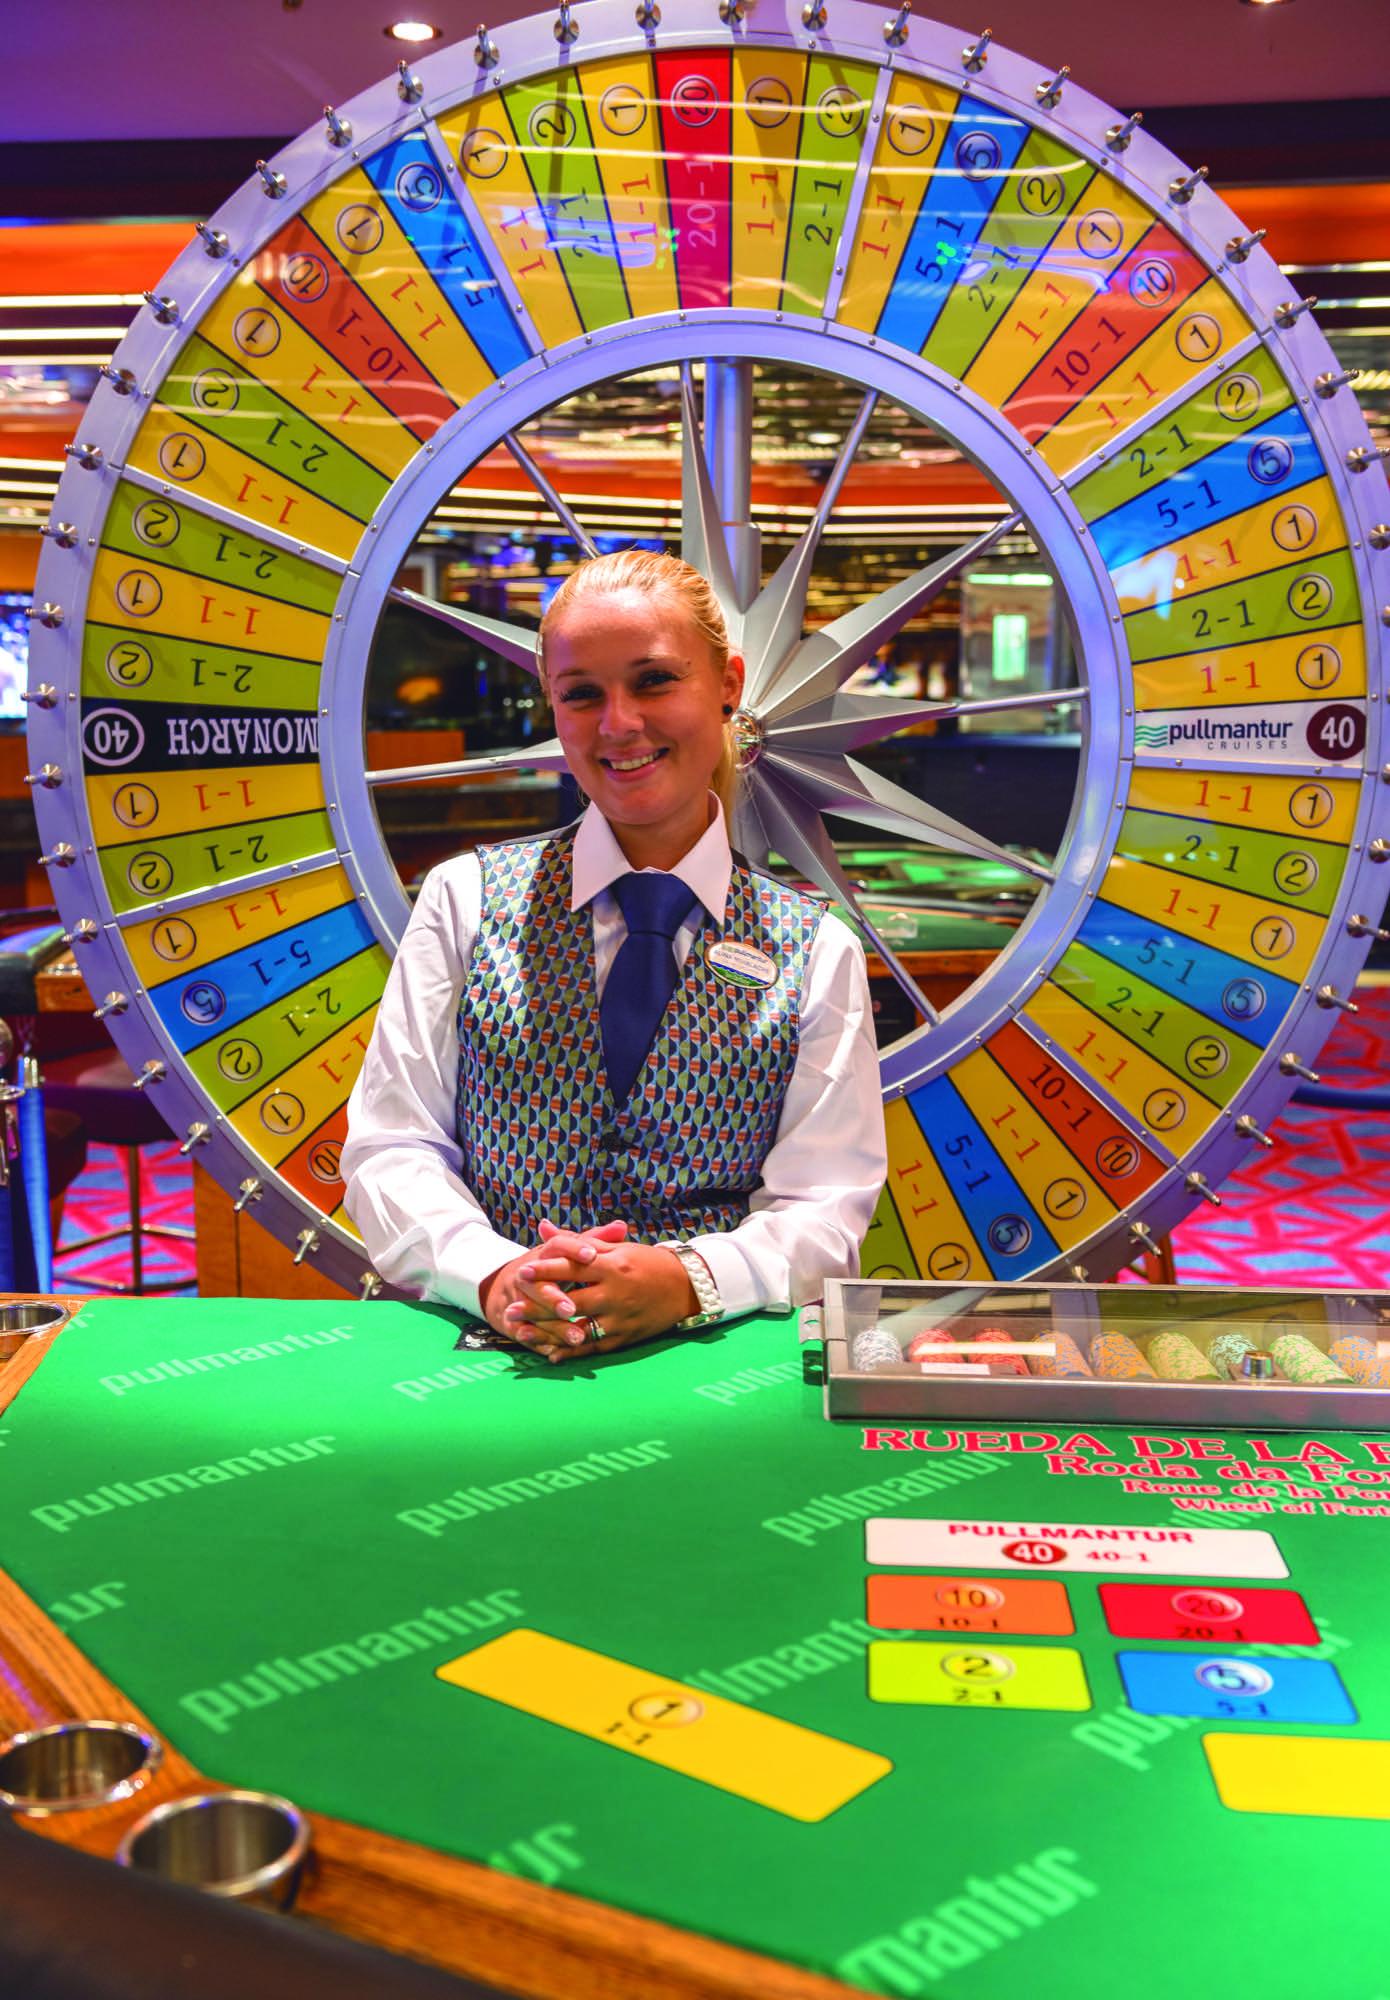 Pullmantur Monarch Interior Casino 2.jpg